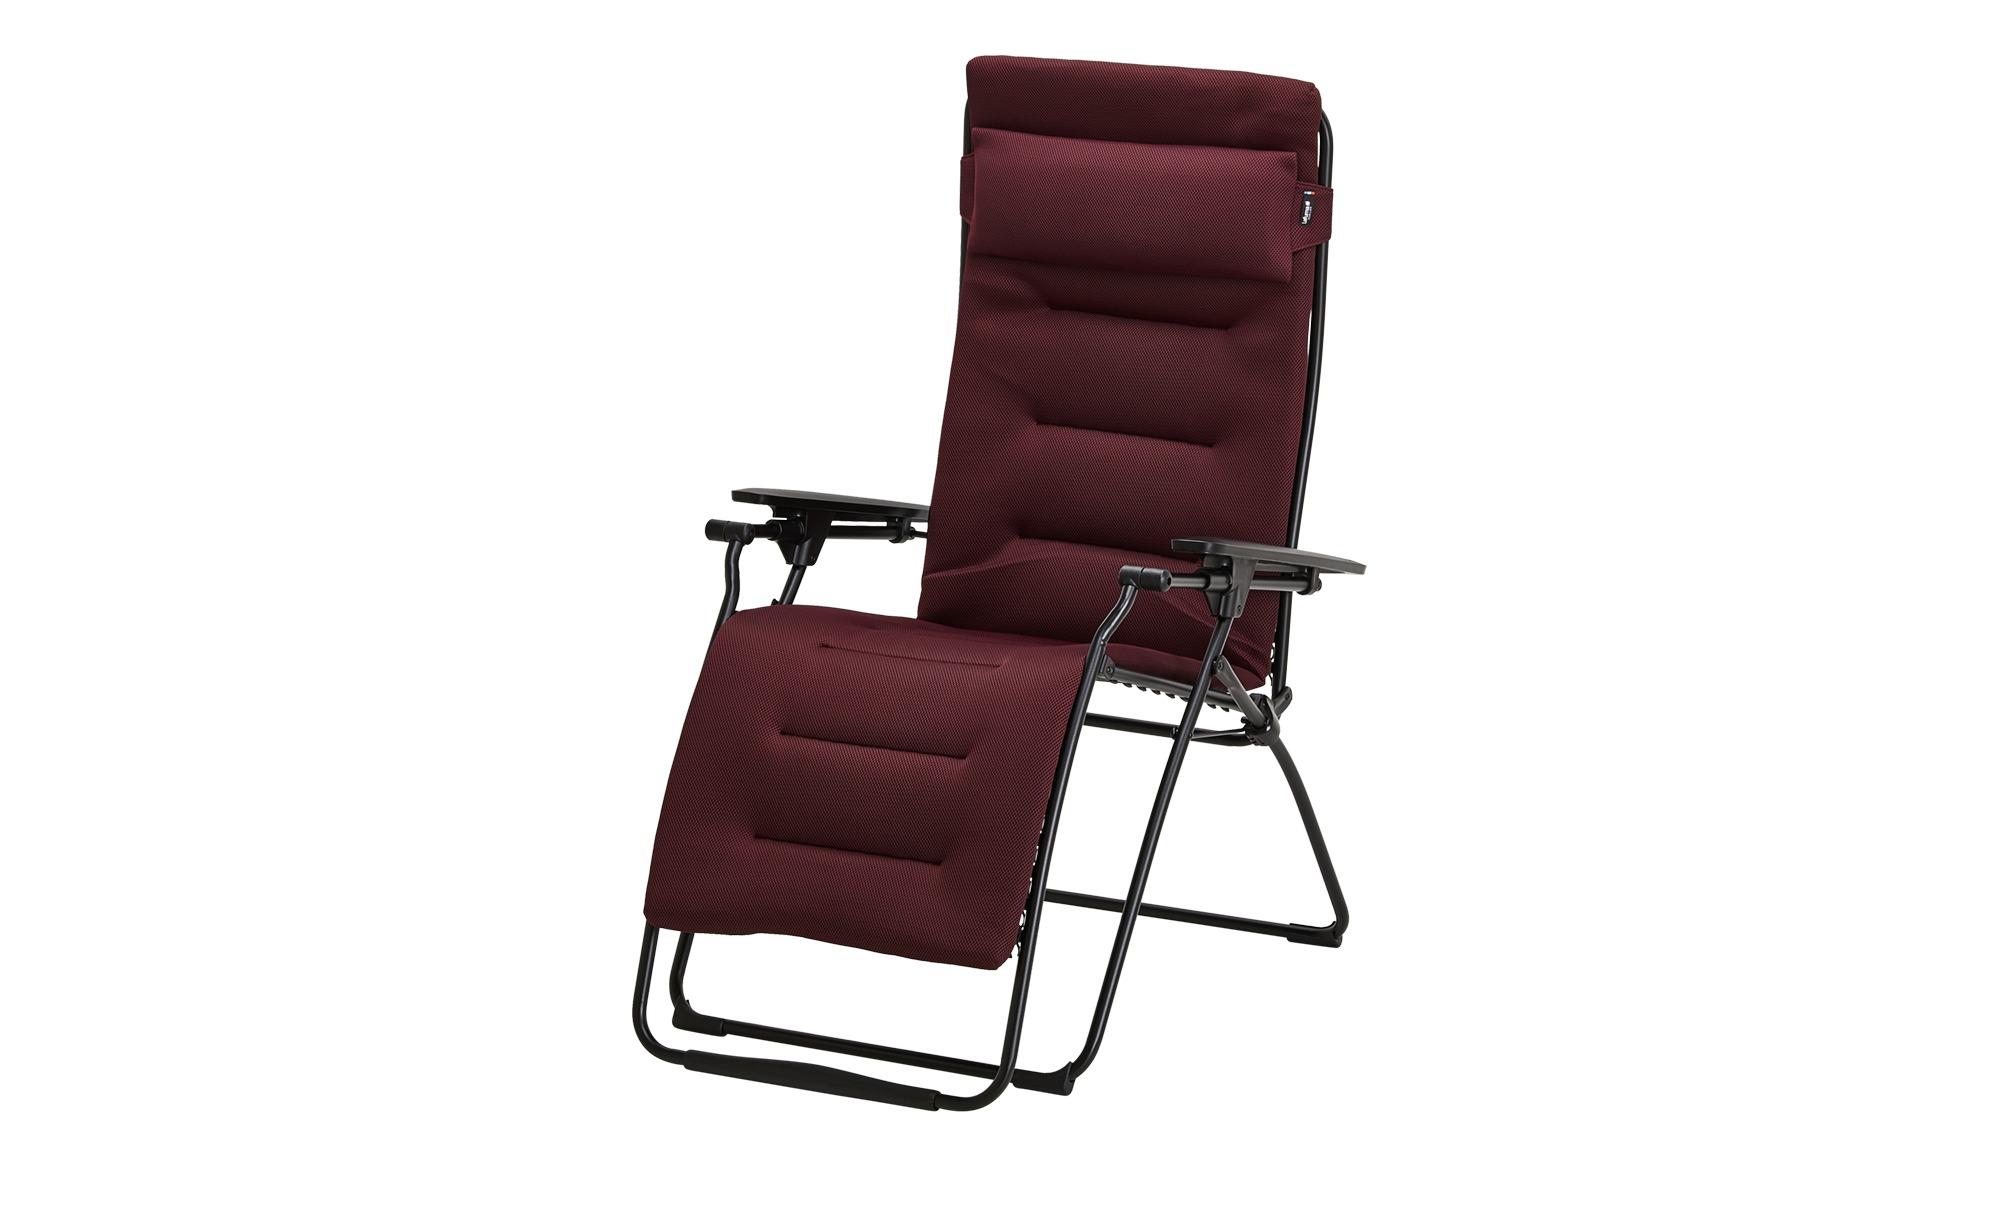 Relaxsessel  Futura Air Comfort ¦ rot ¦ Maße (cm): B: 76 H: 90 T: 125 Garten > Gartenmöbel > Gartenstühle - Höffner